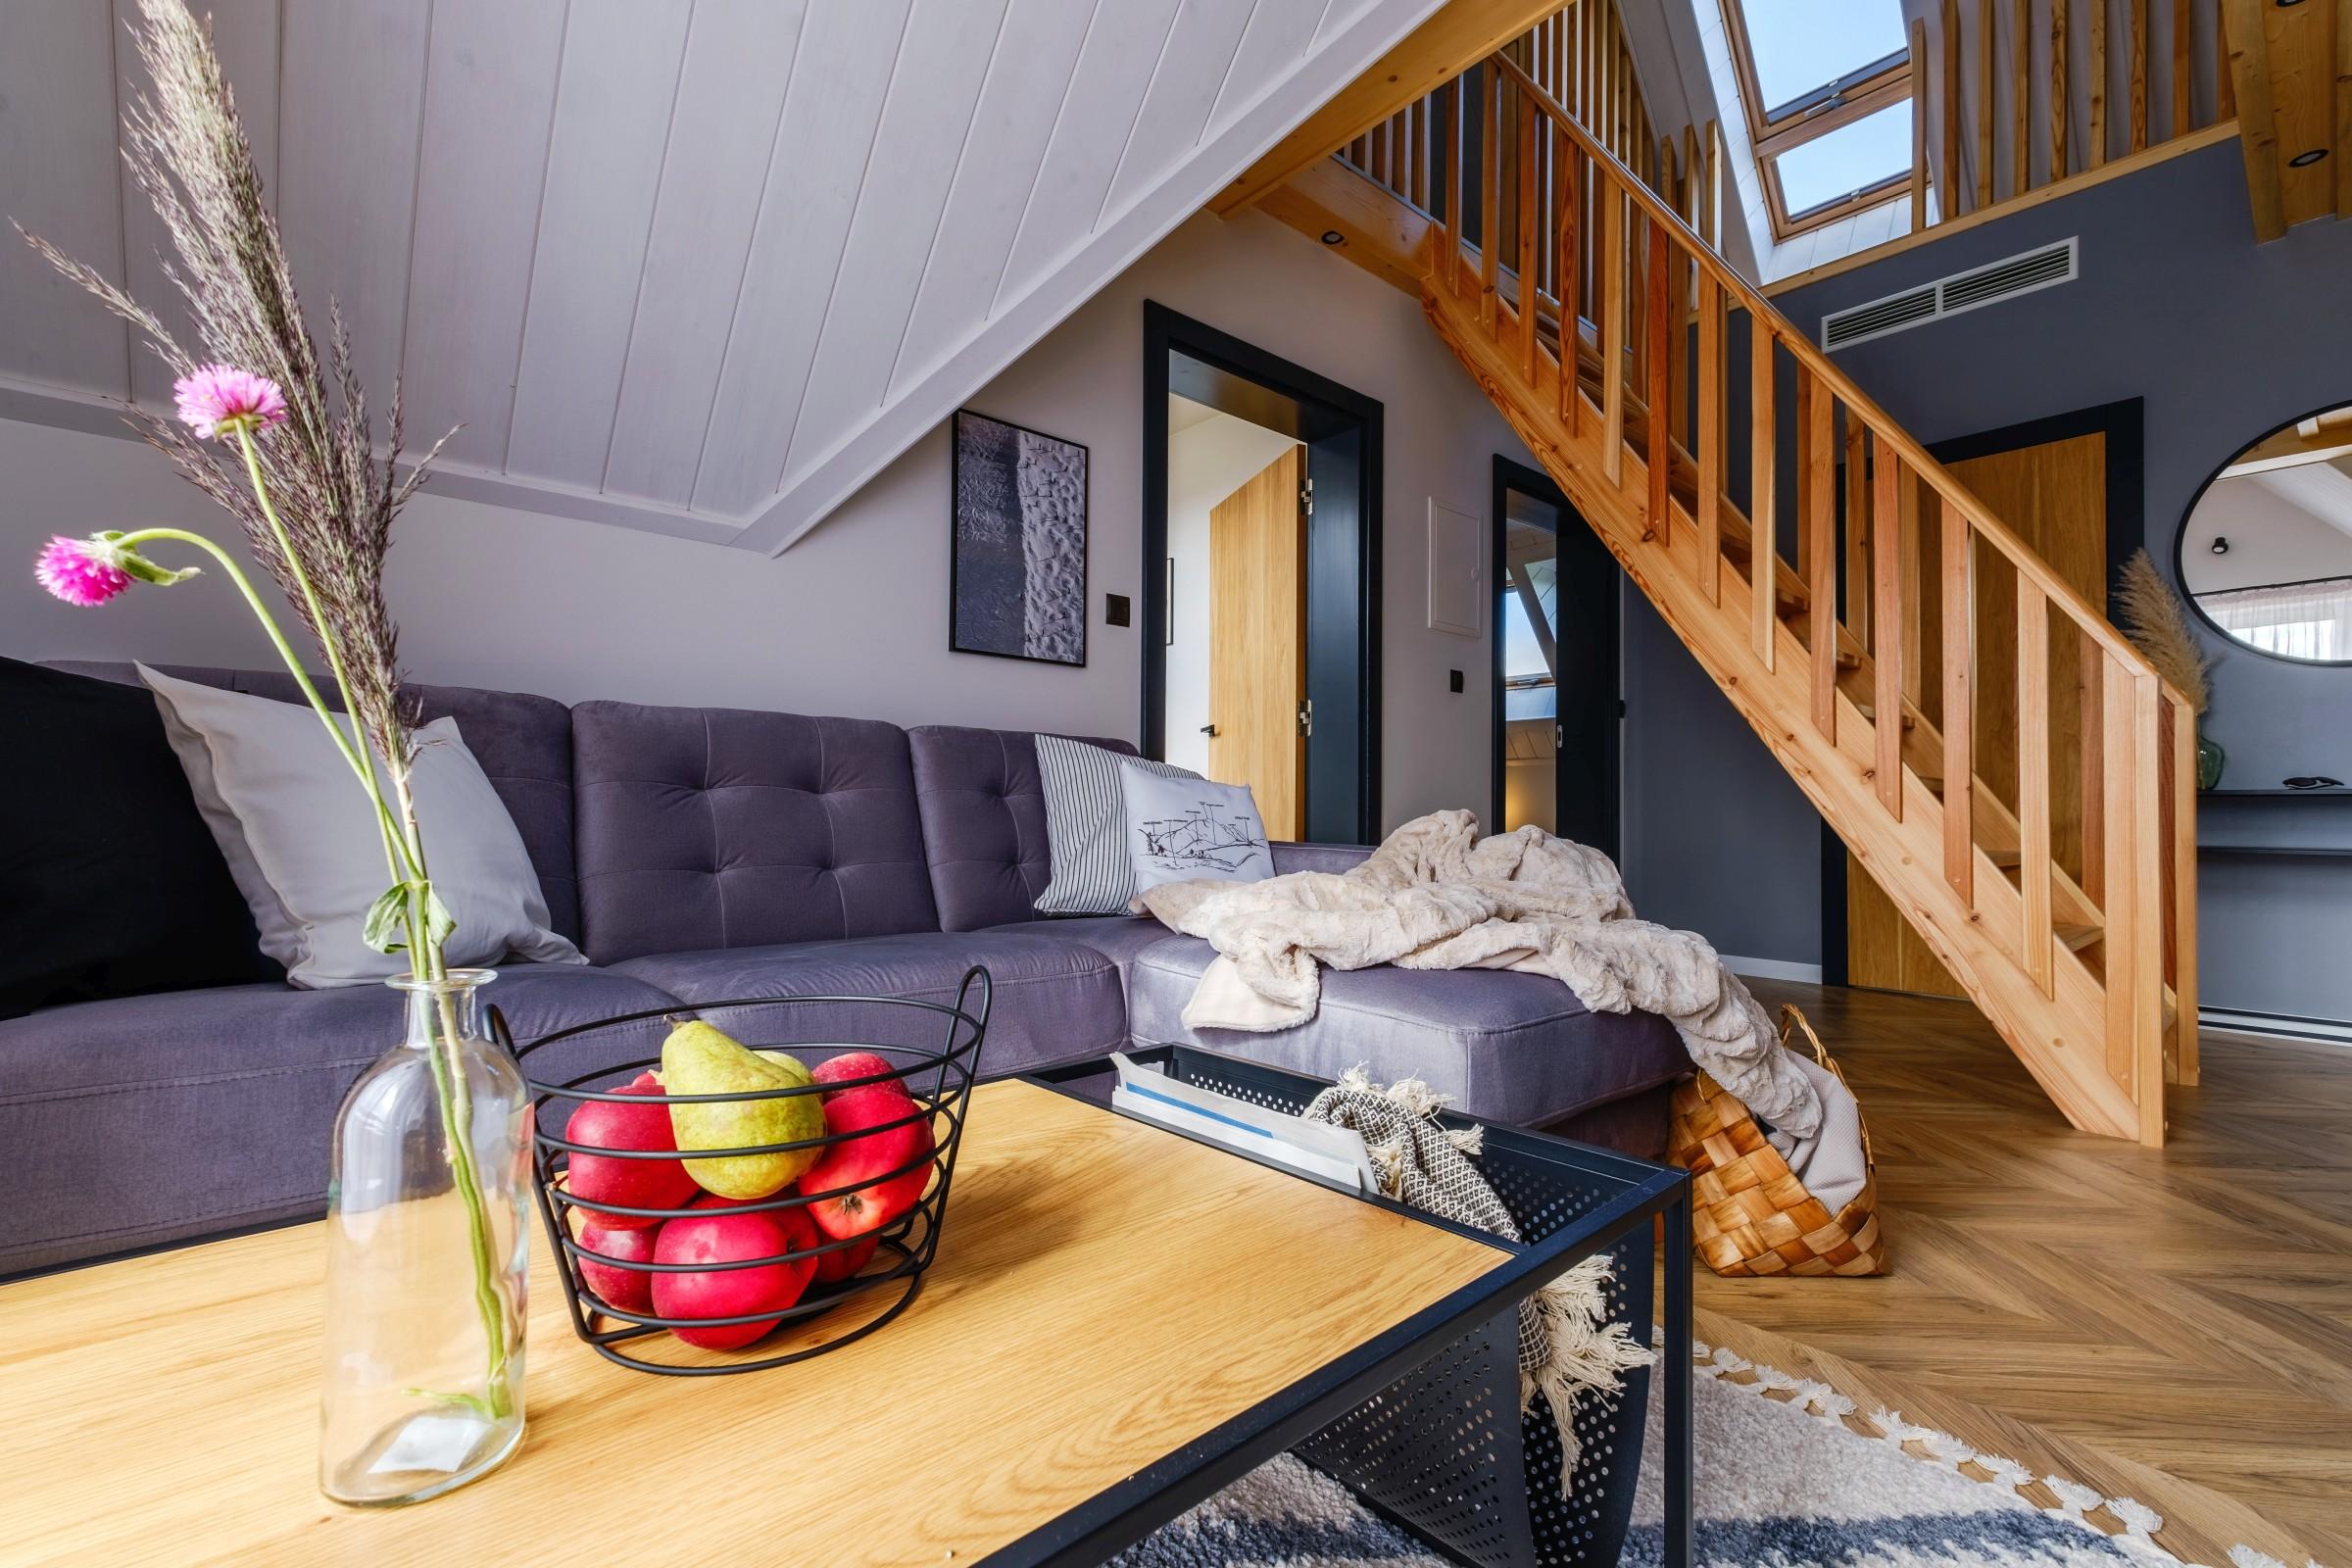 Apartamenty NOVA BIAŁKA Białka Tatrzańska apartament 8 salon 2